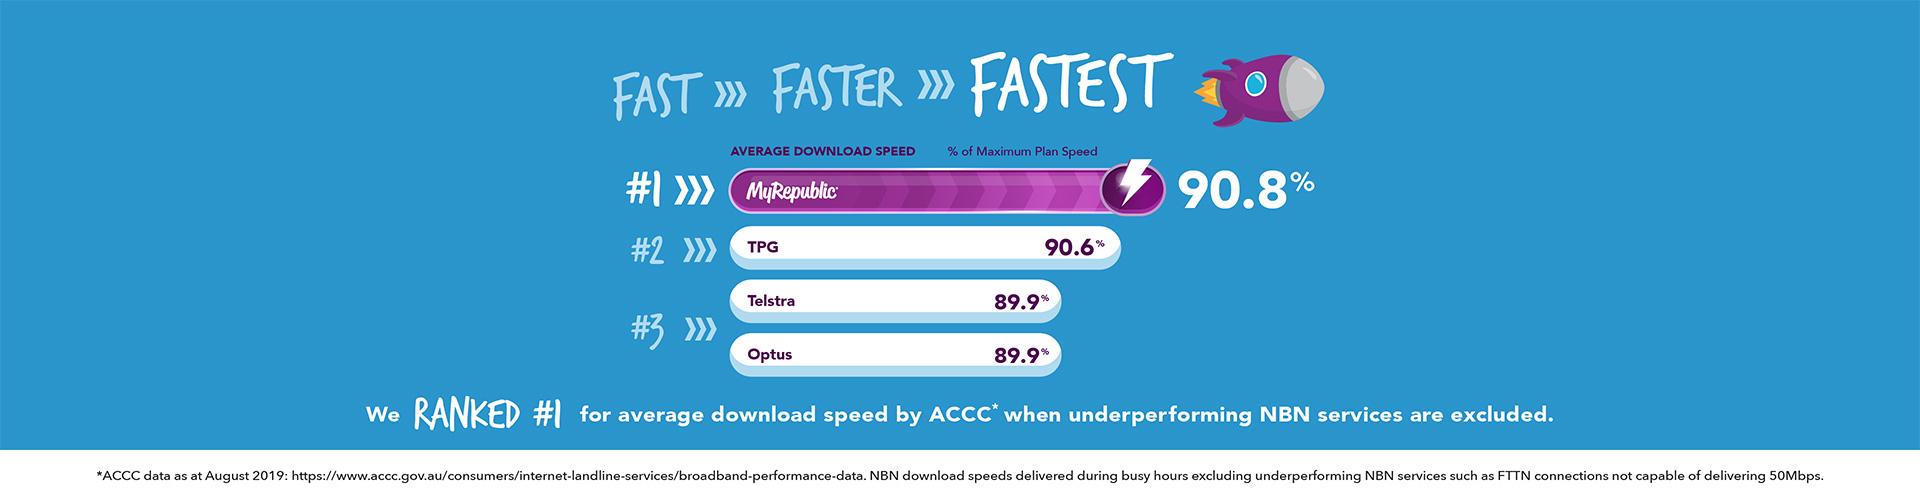 MyRepublic Australia ACCC Ranked#1 Fastest Average Download Speed.